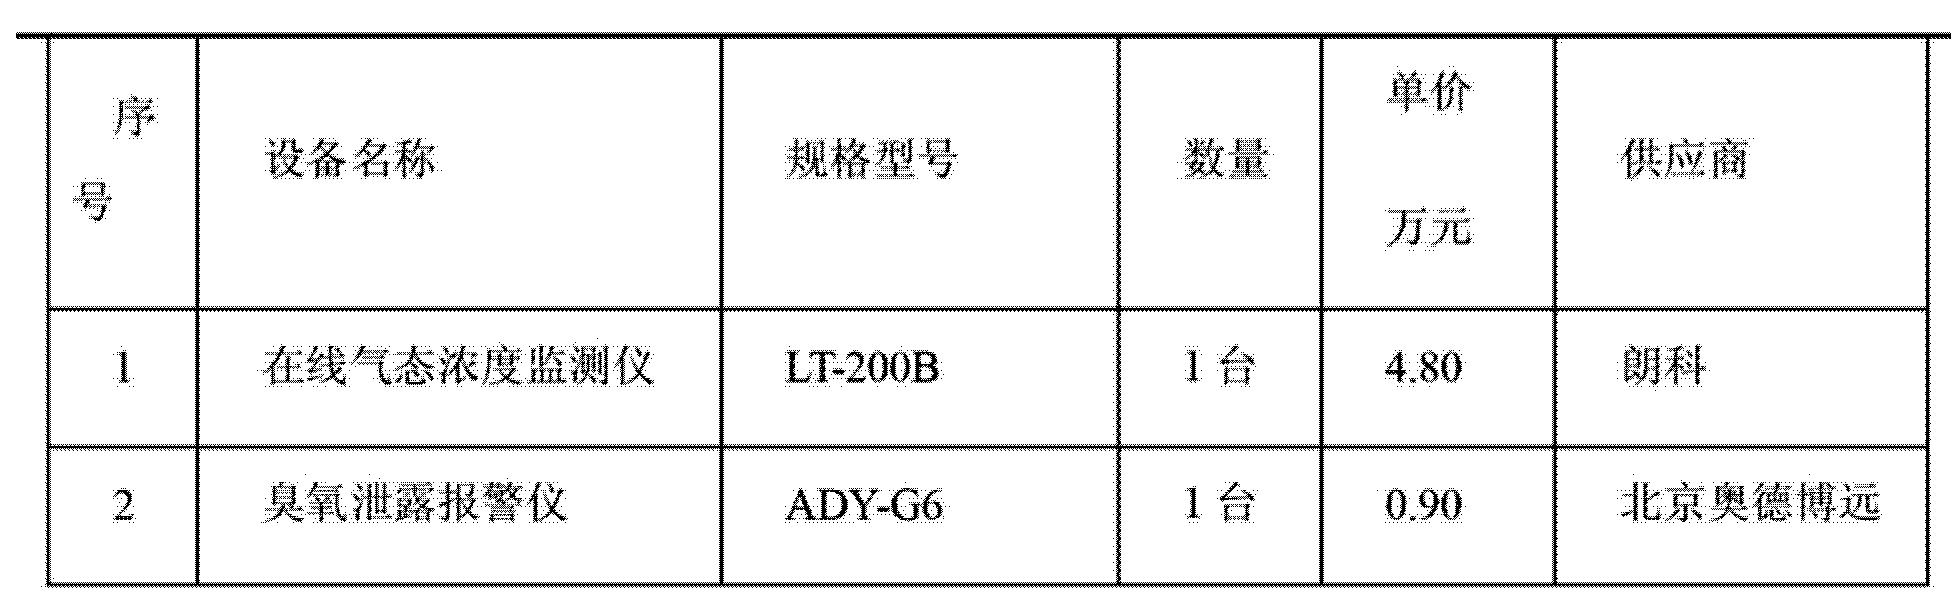 Cn203461871u Advanced Ozone Oxidation Device Google Patents Generator Circuit Water For Pool Figure Cn203461871ud00081